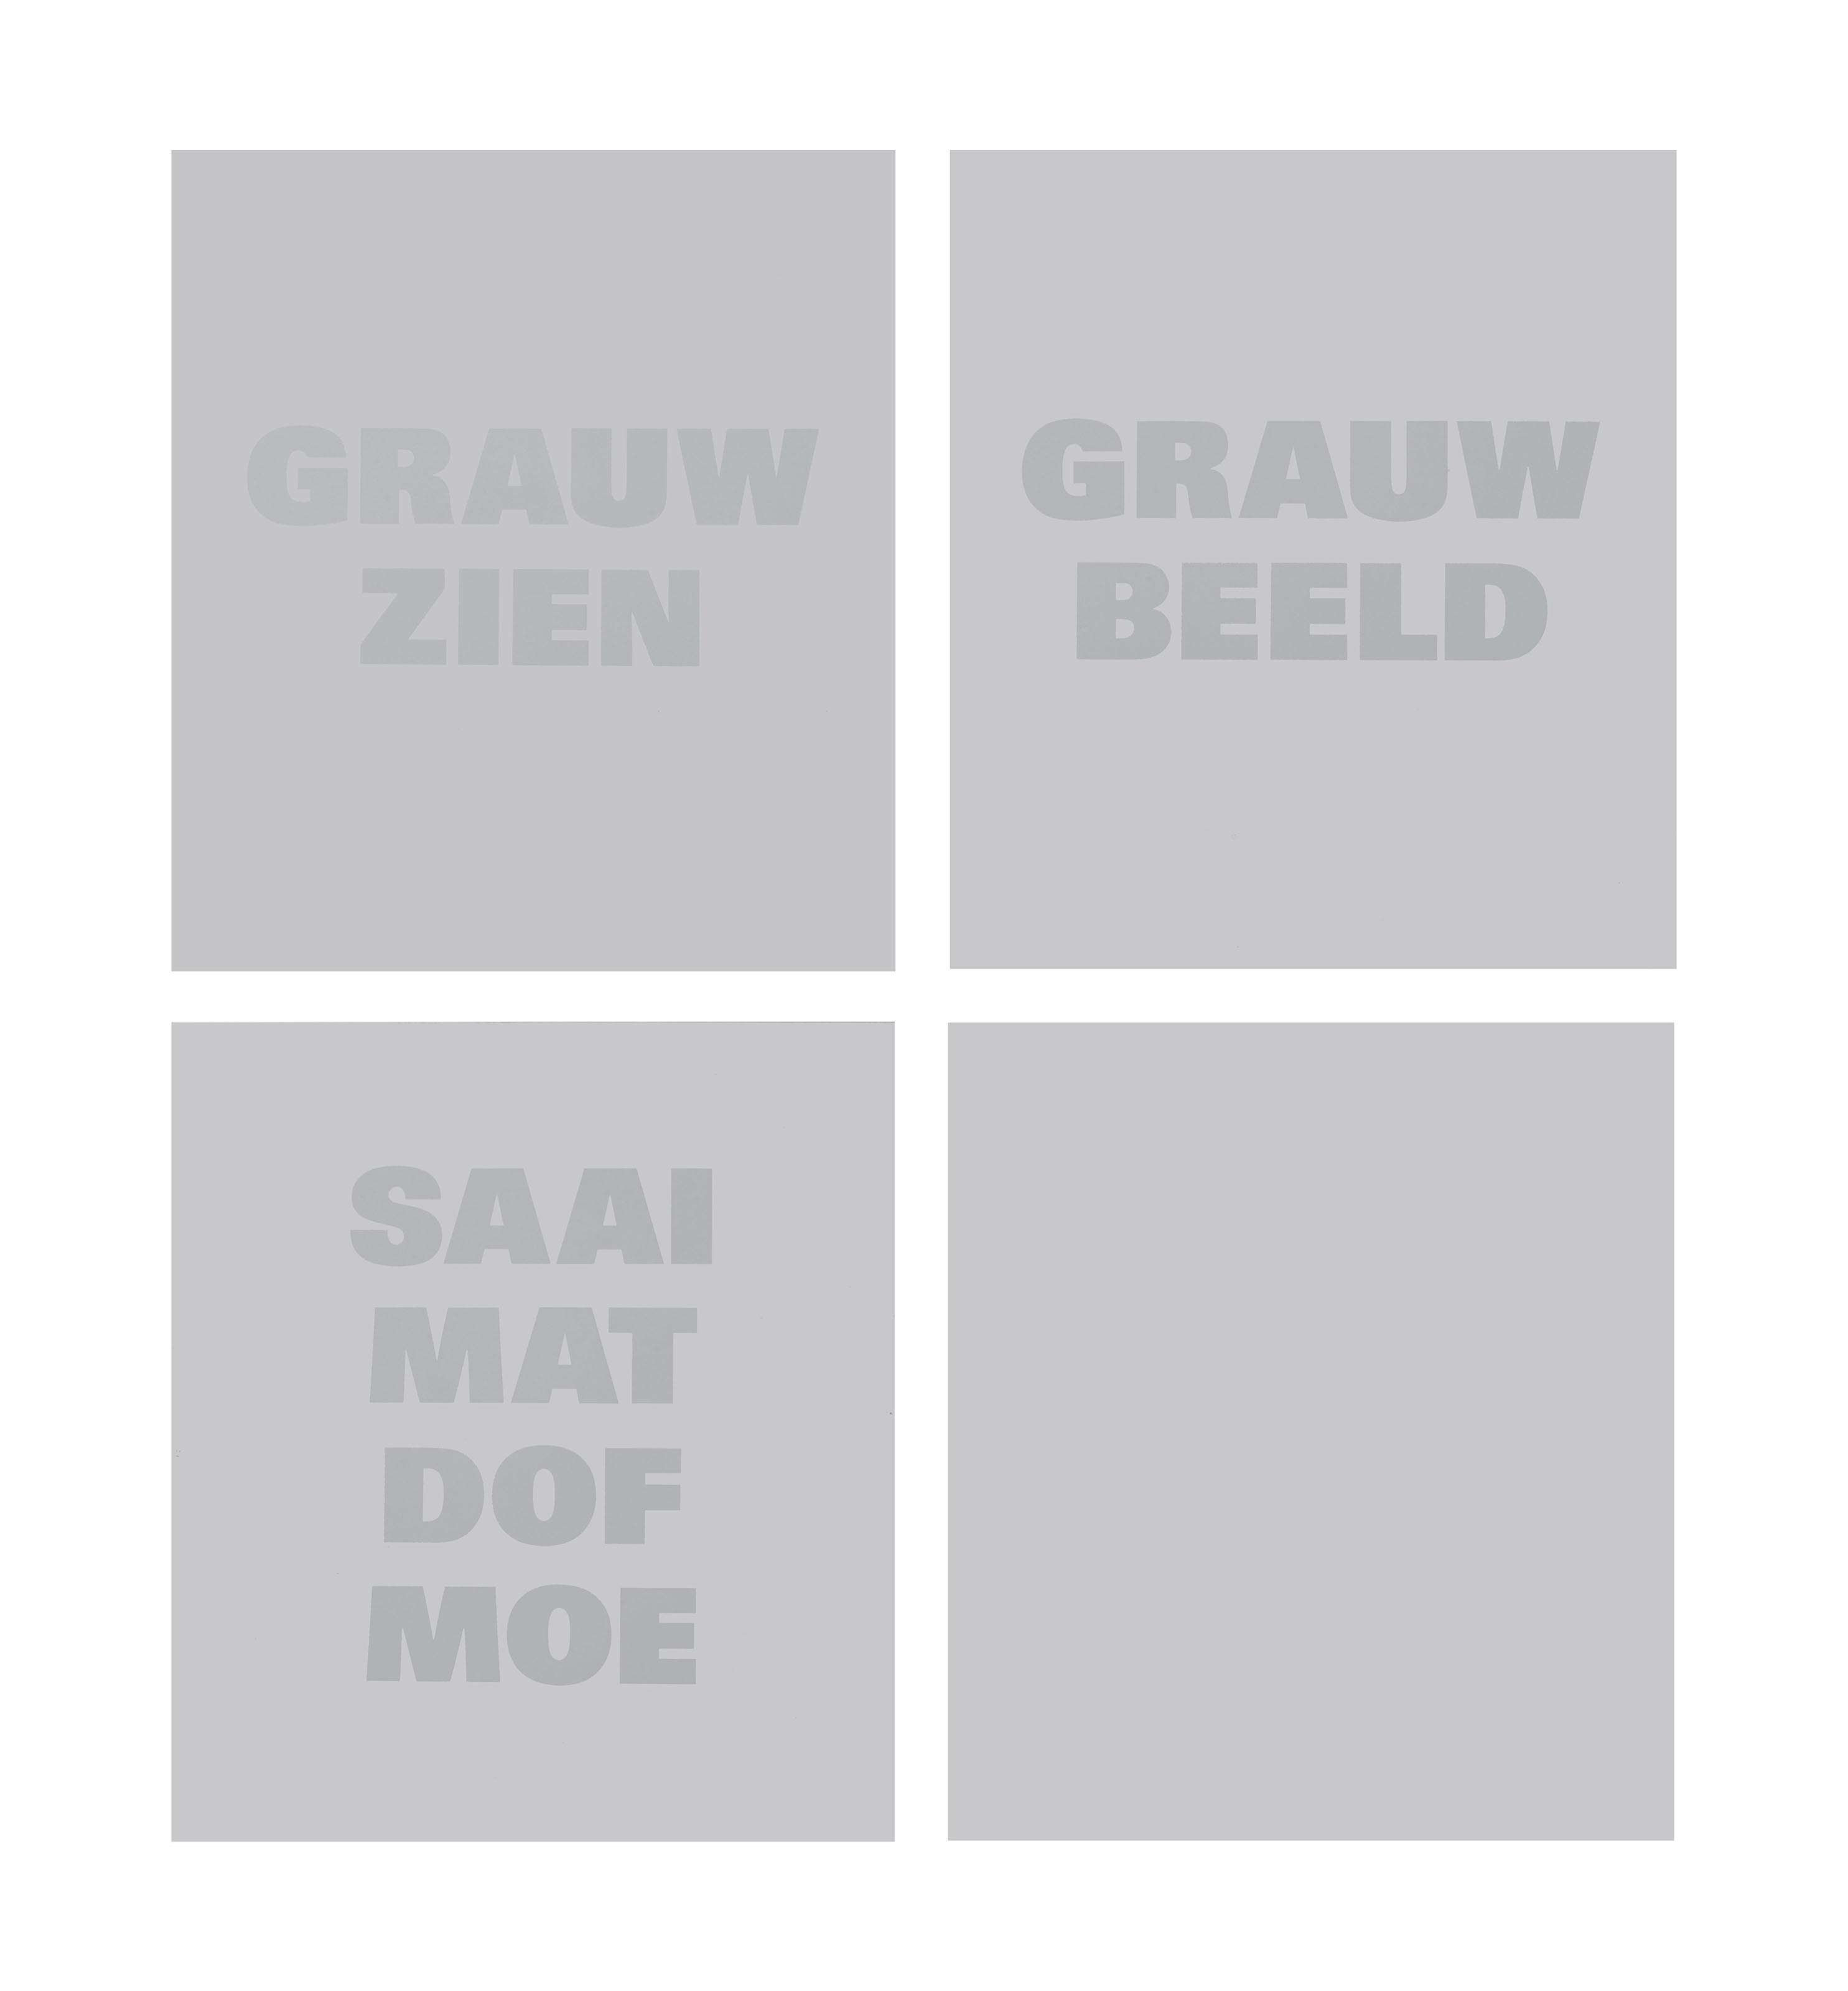 Grauw Zien, Grauw Beeld, Saai Mat Dof Moe (Bleak Look, Bleak Image, Drab Matte Dull Tired)